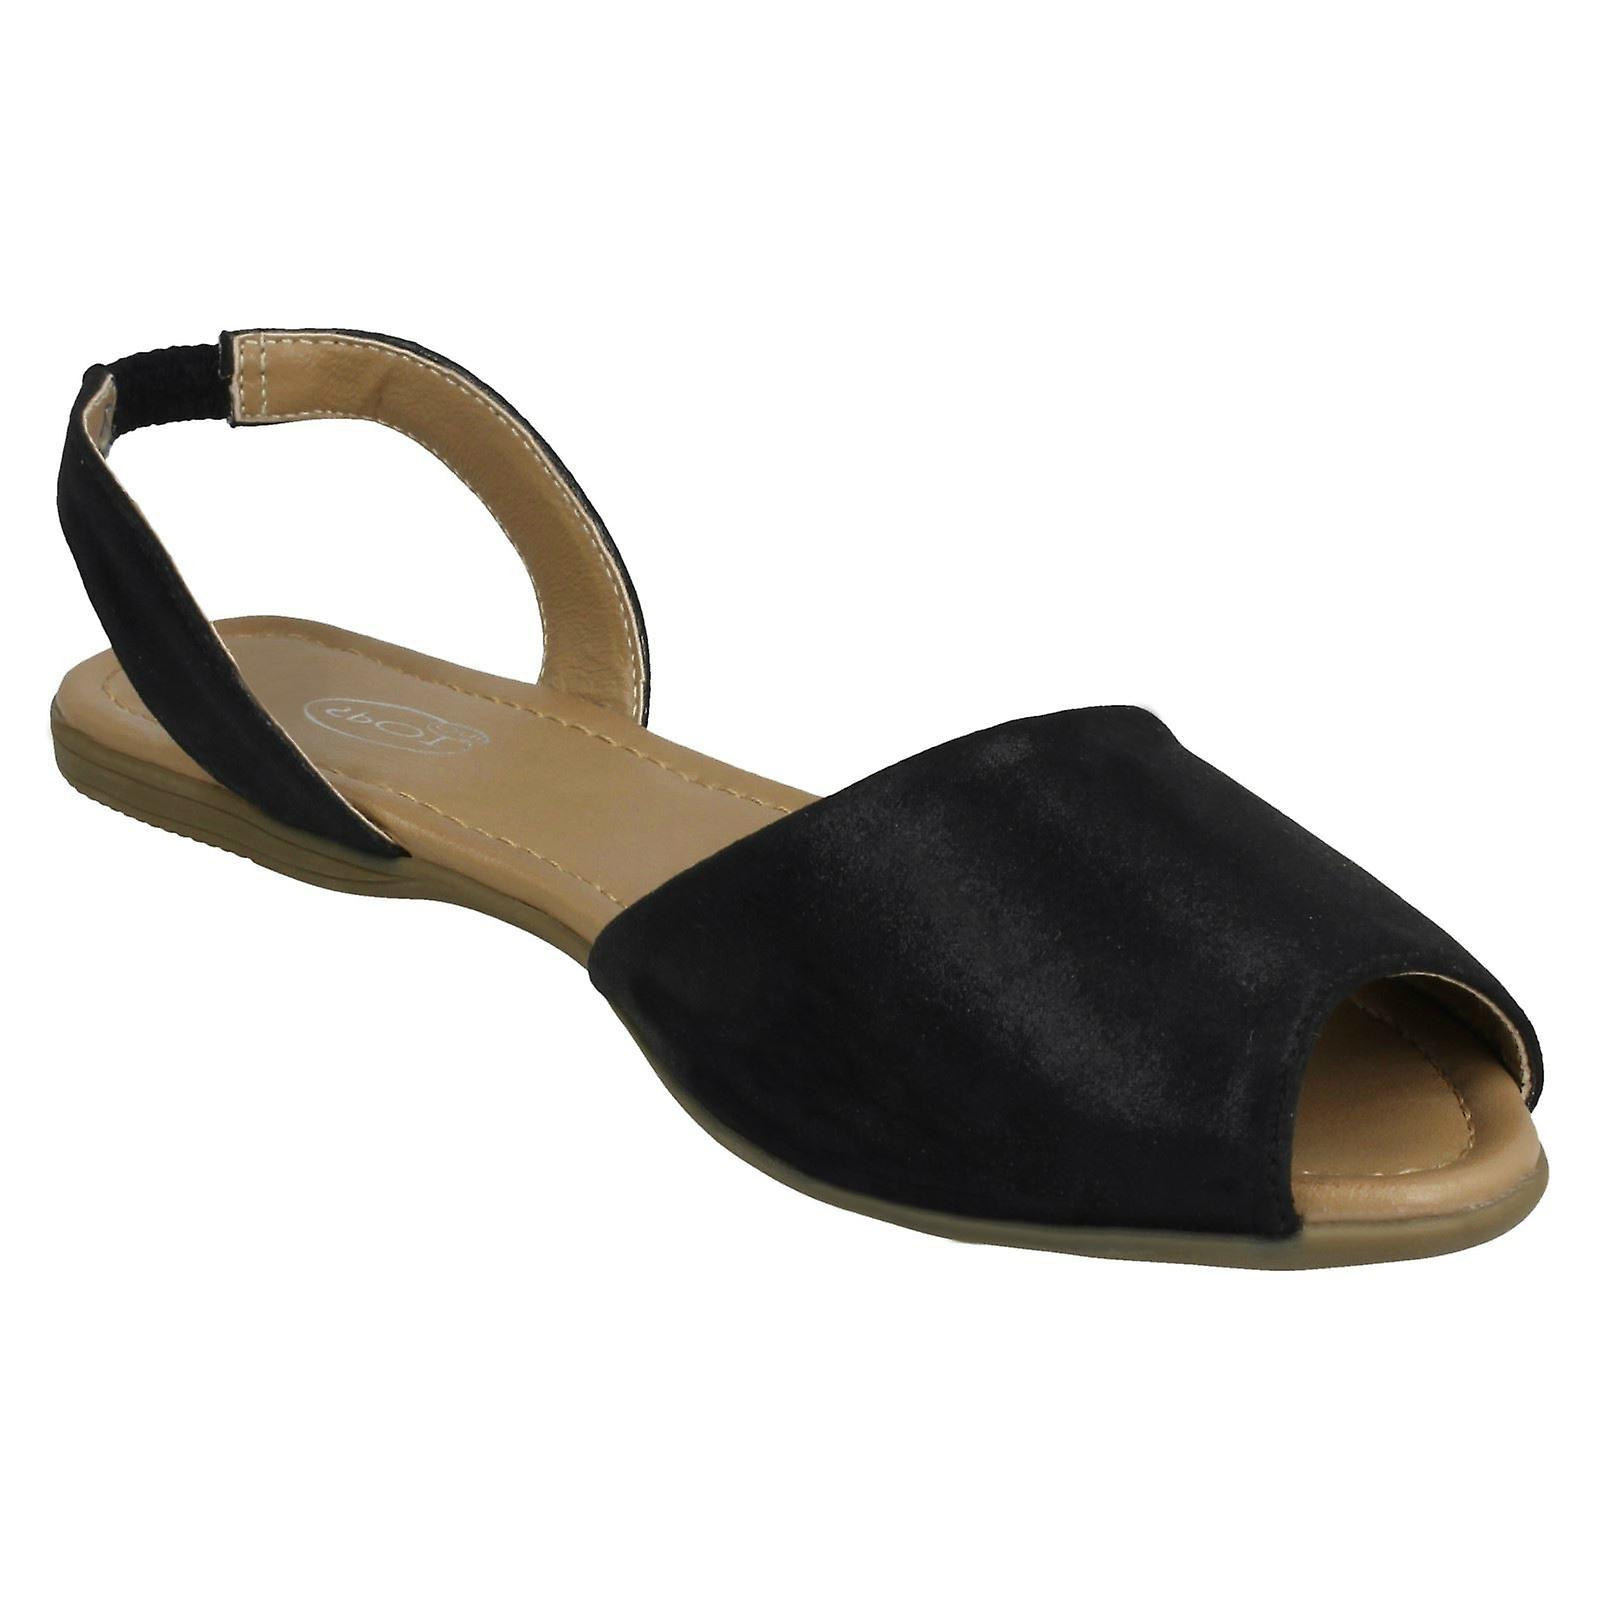 Ladies Spot On Flat Slingback Mule Sandals - Gratis frakt